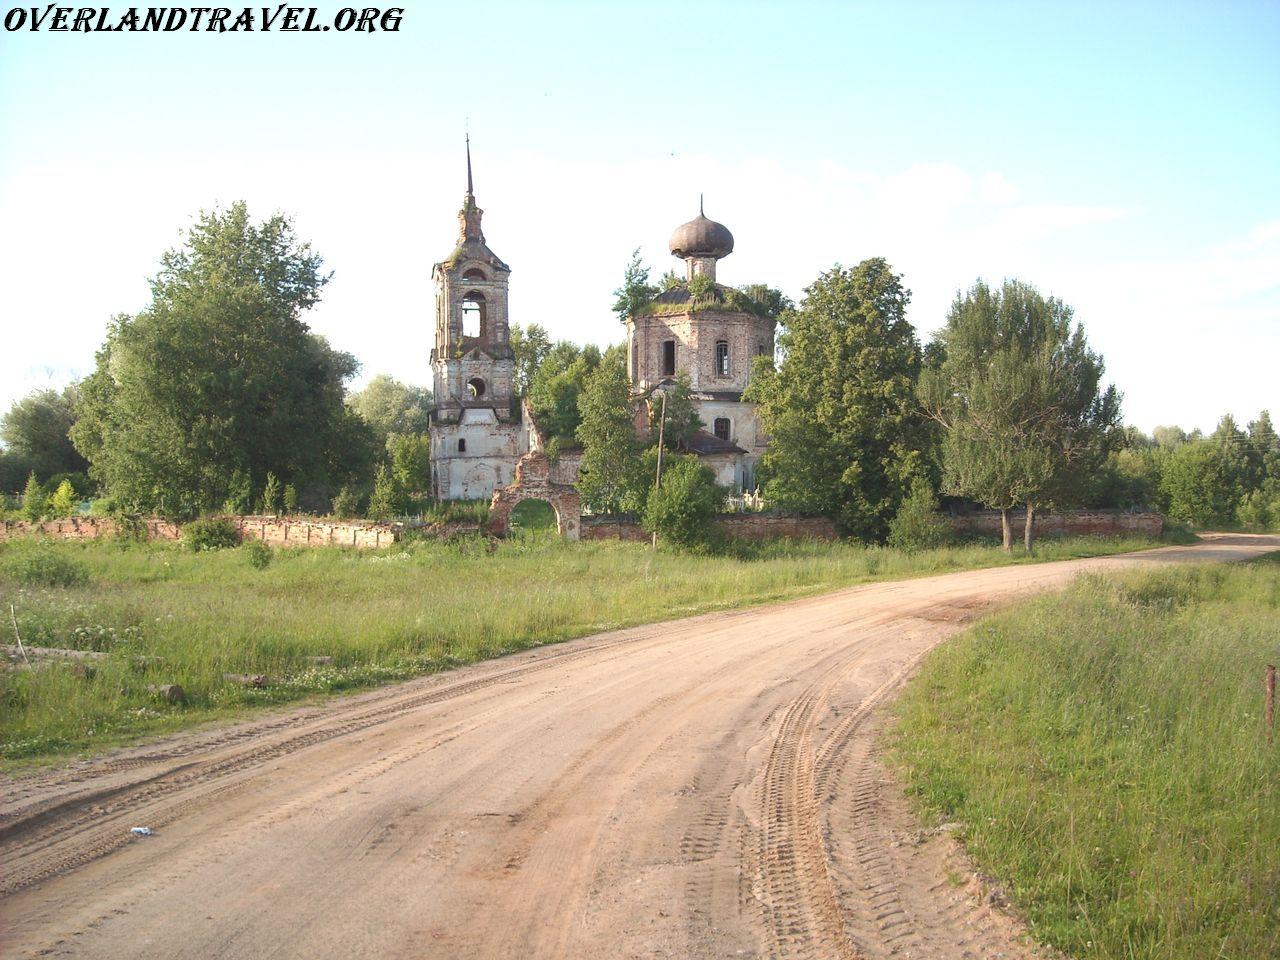 Russia, Valdai overland travel